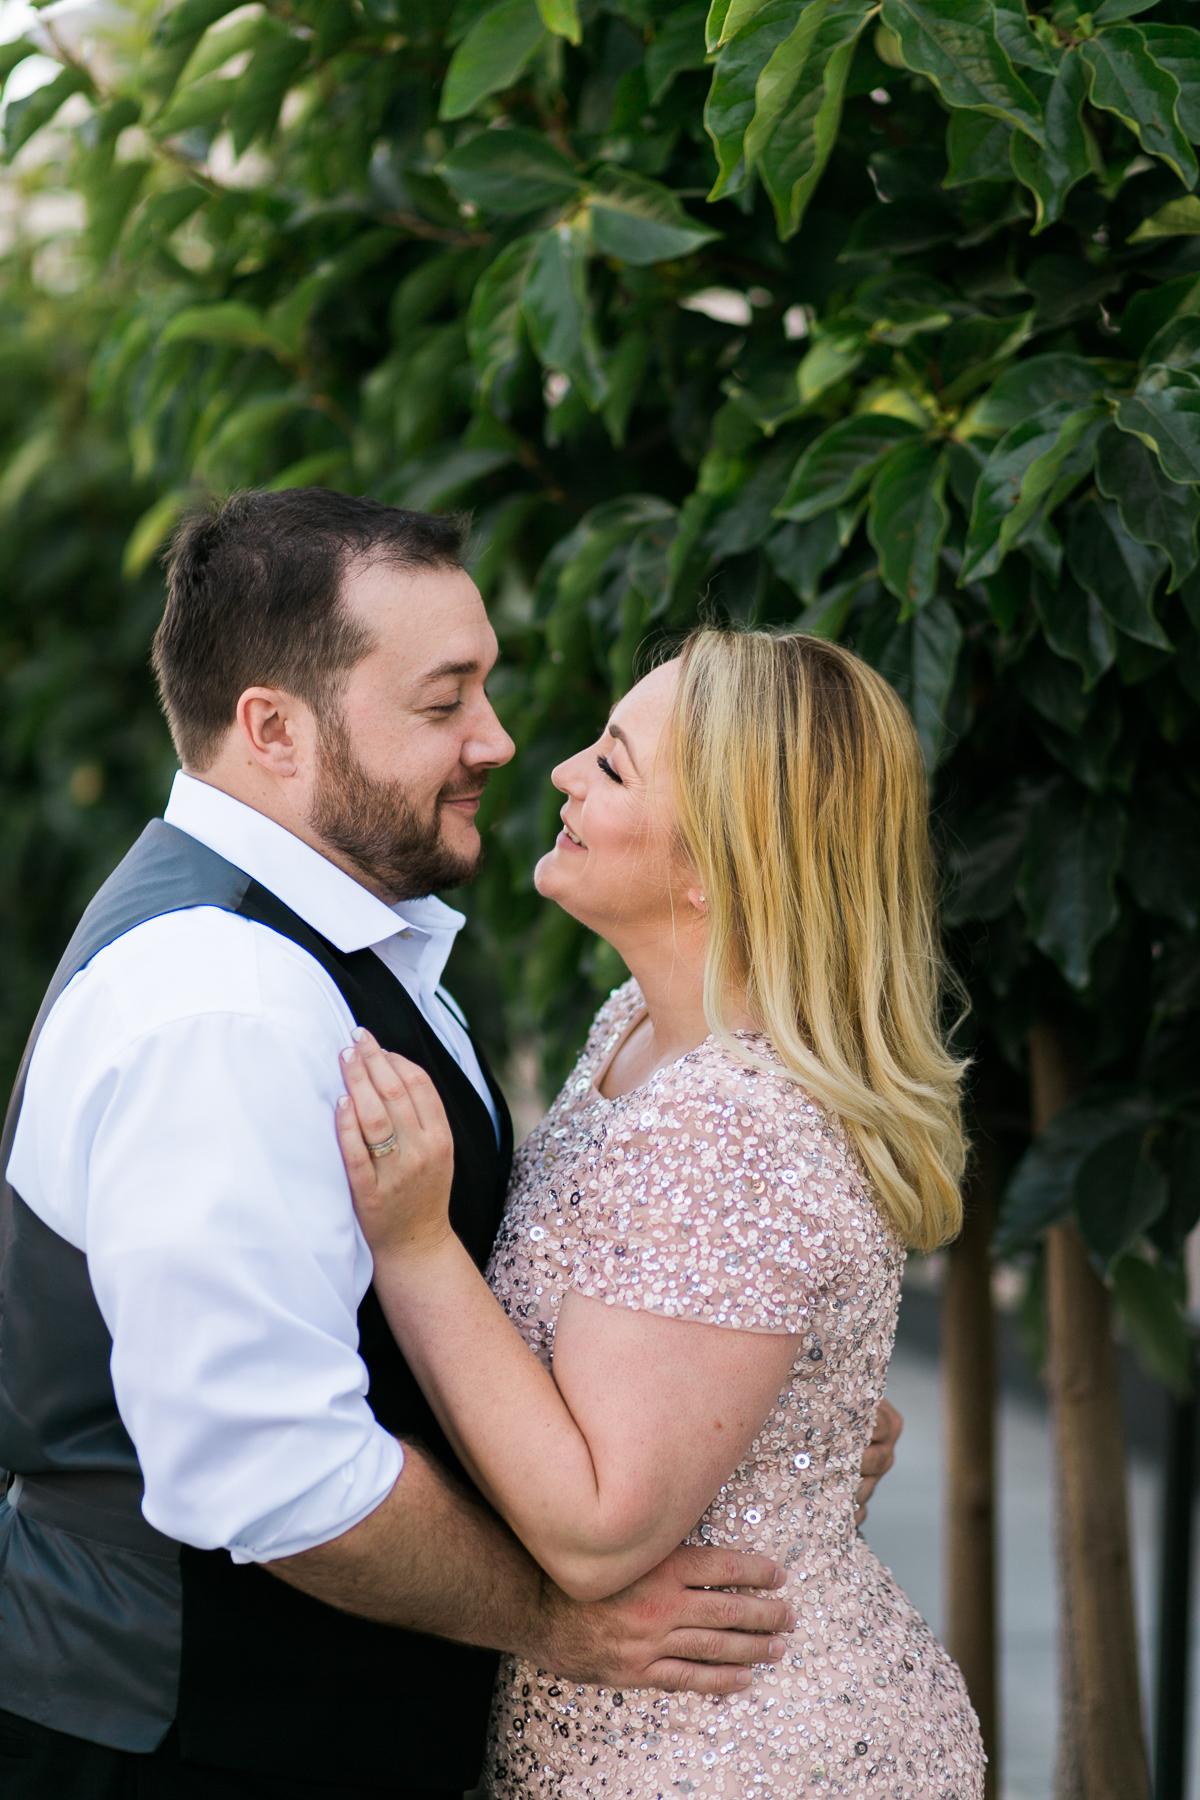 Sebastopol Barlow Wedding Photography Maria Villano-12.jpg